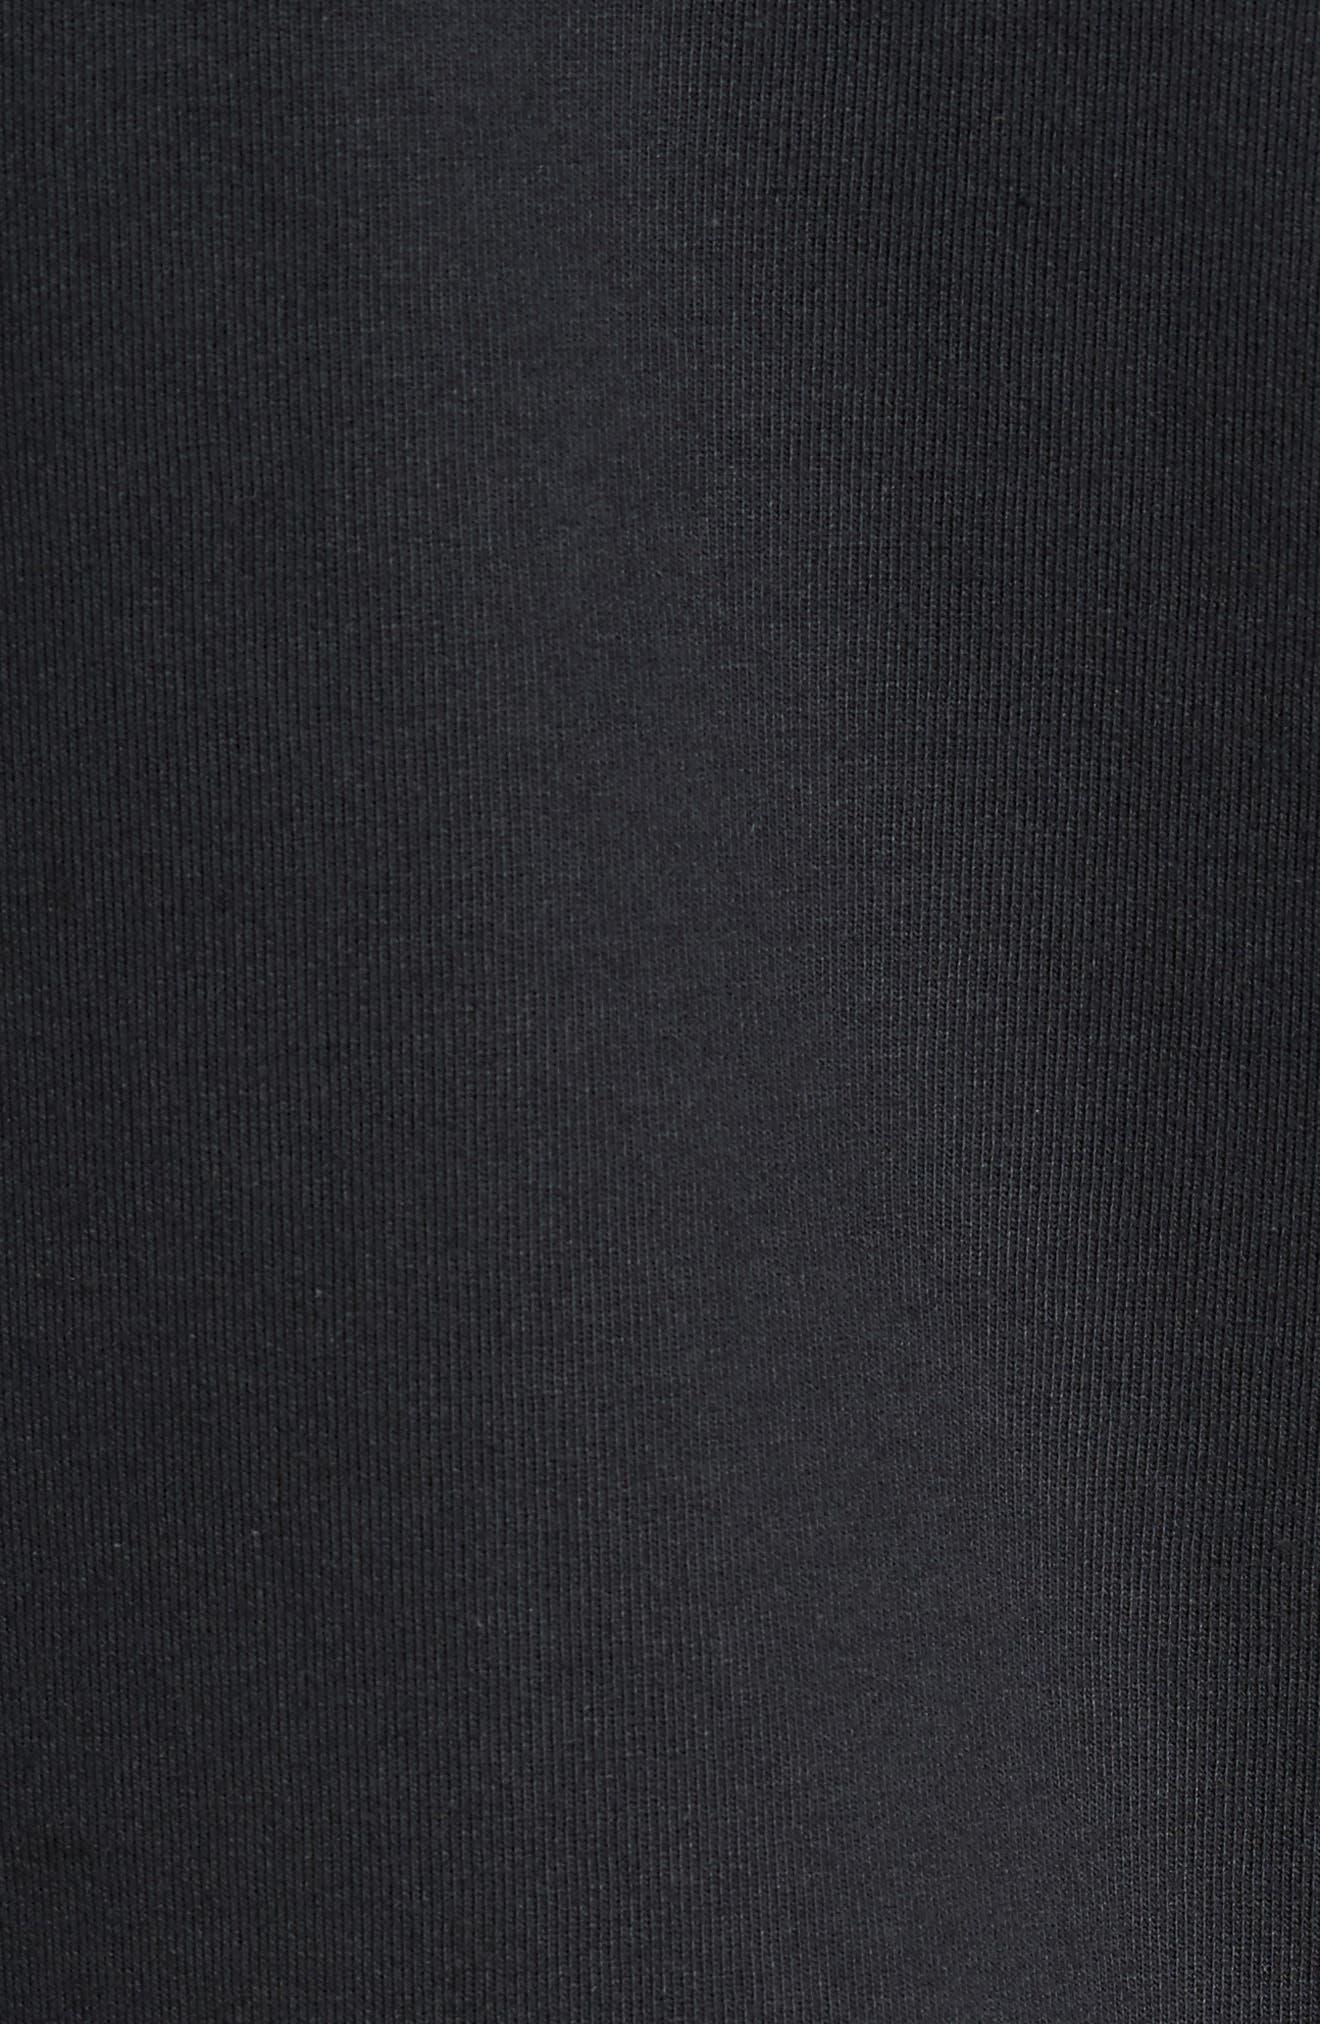 B-Side Reversible Crewneck Sweatshirt,                             Alternate thumbnail 5, color,                             001